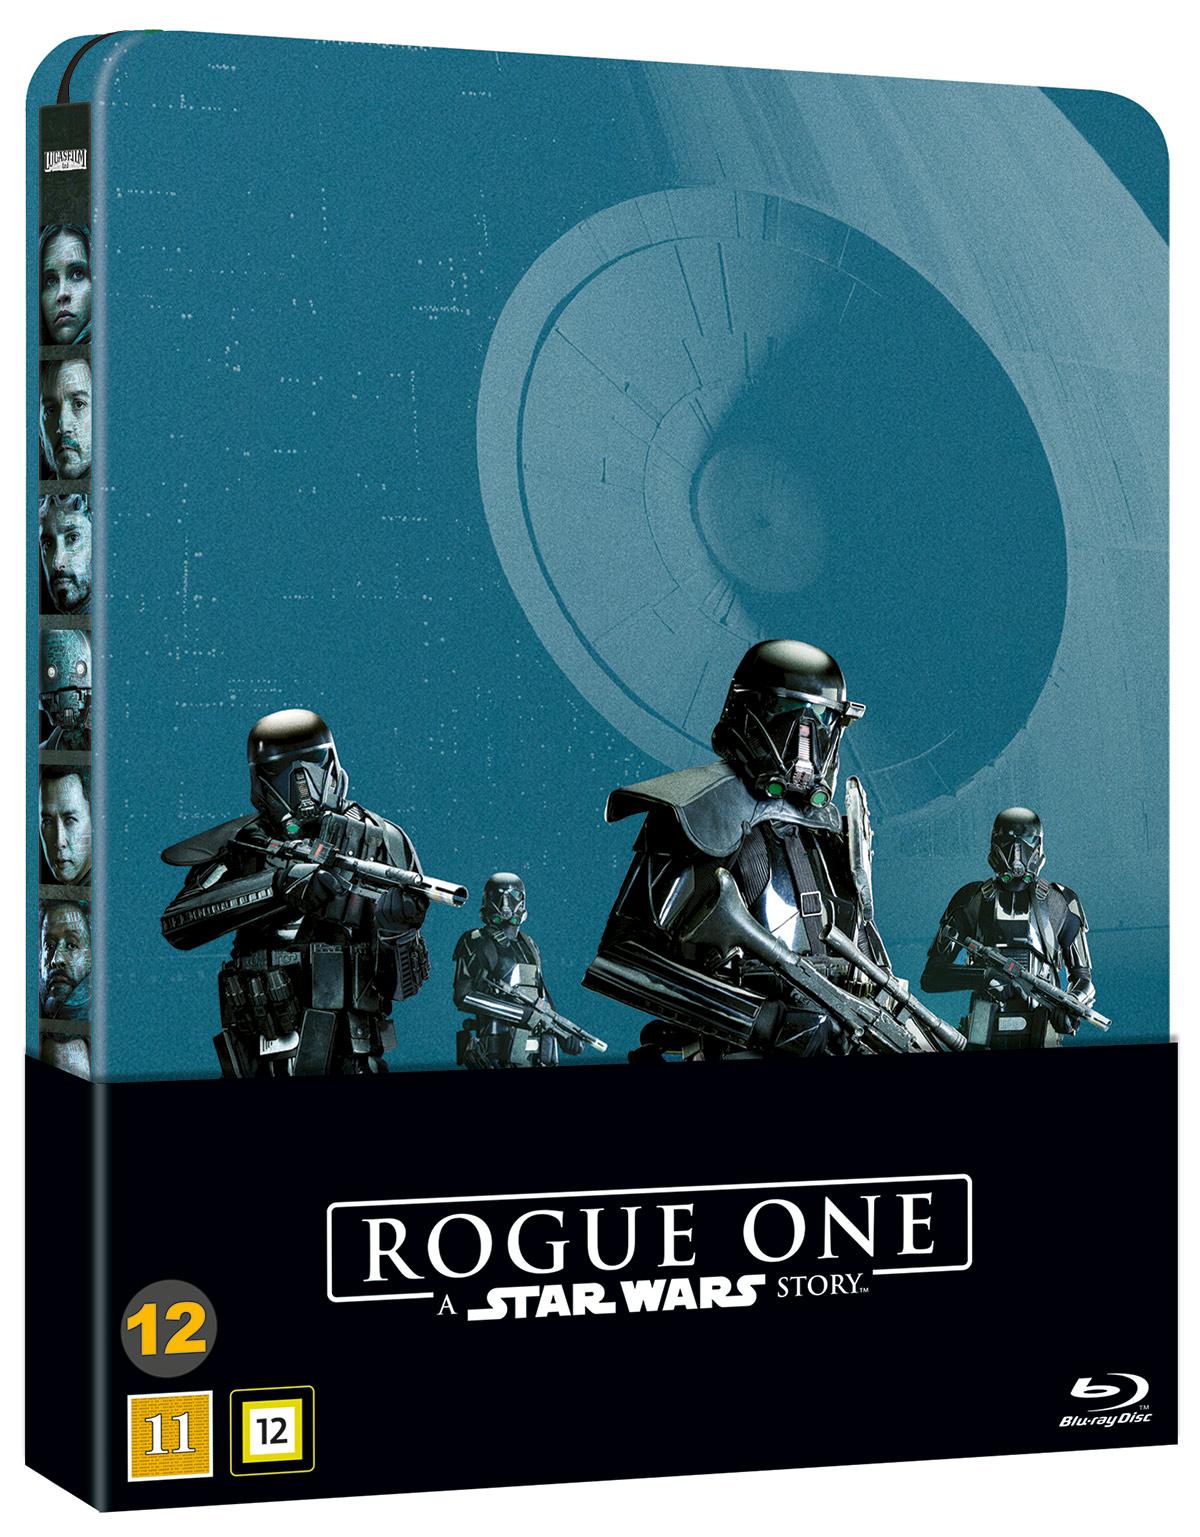 BLU-RAY STEELBOOK: Rogue One: A Star Wars Story.